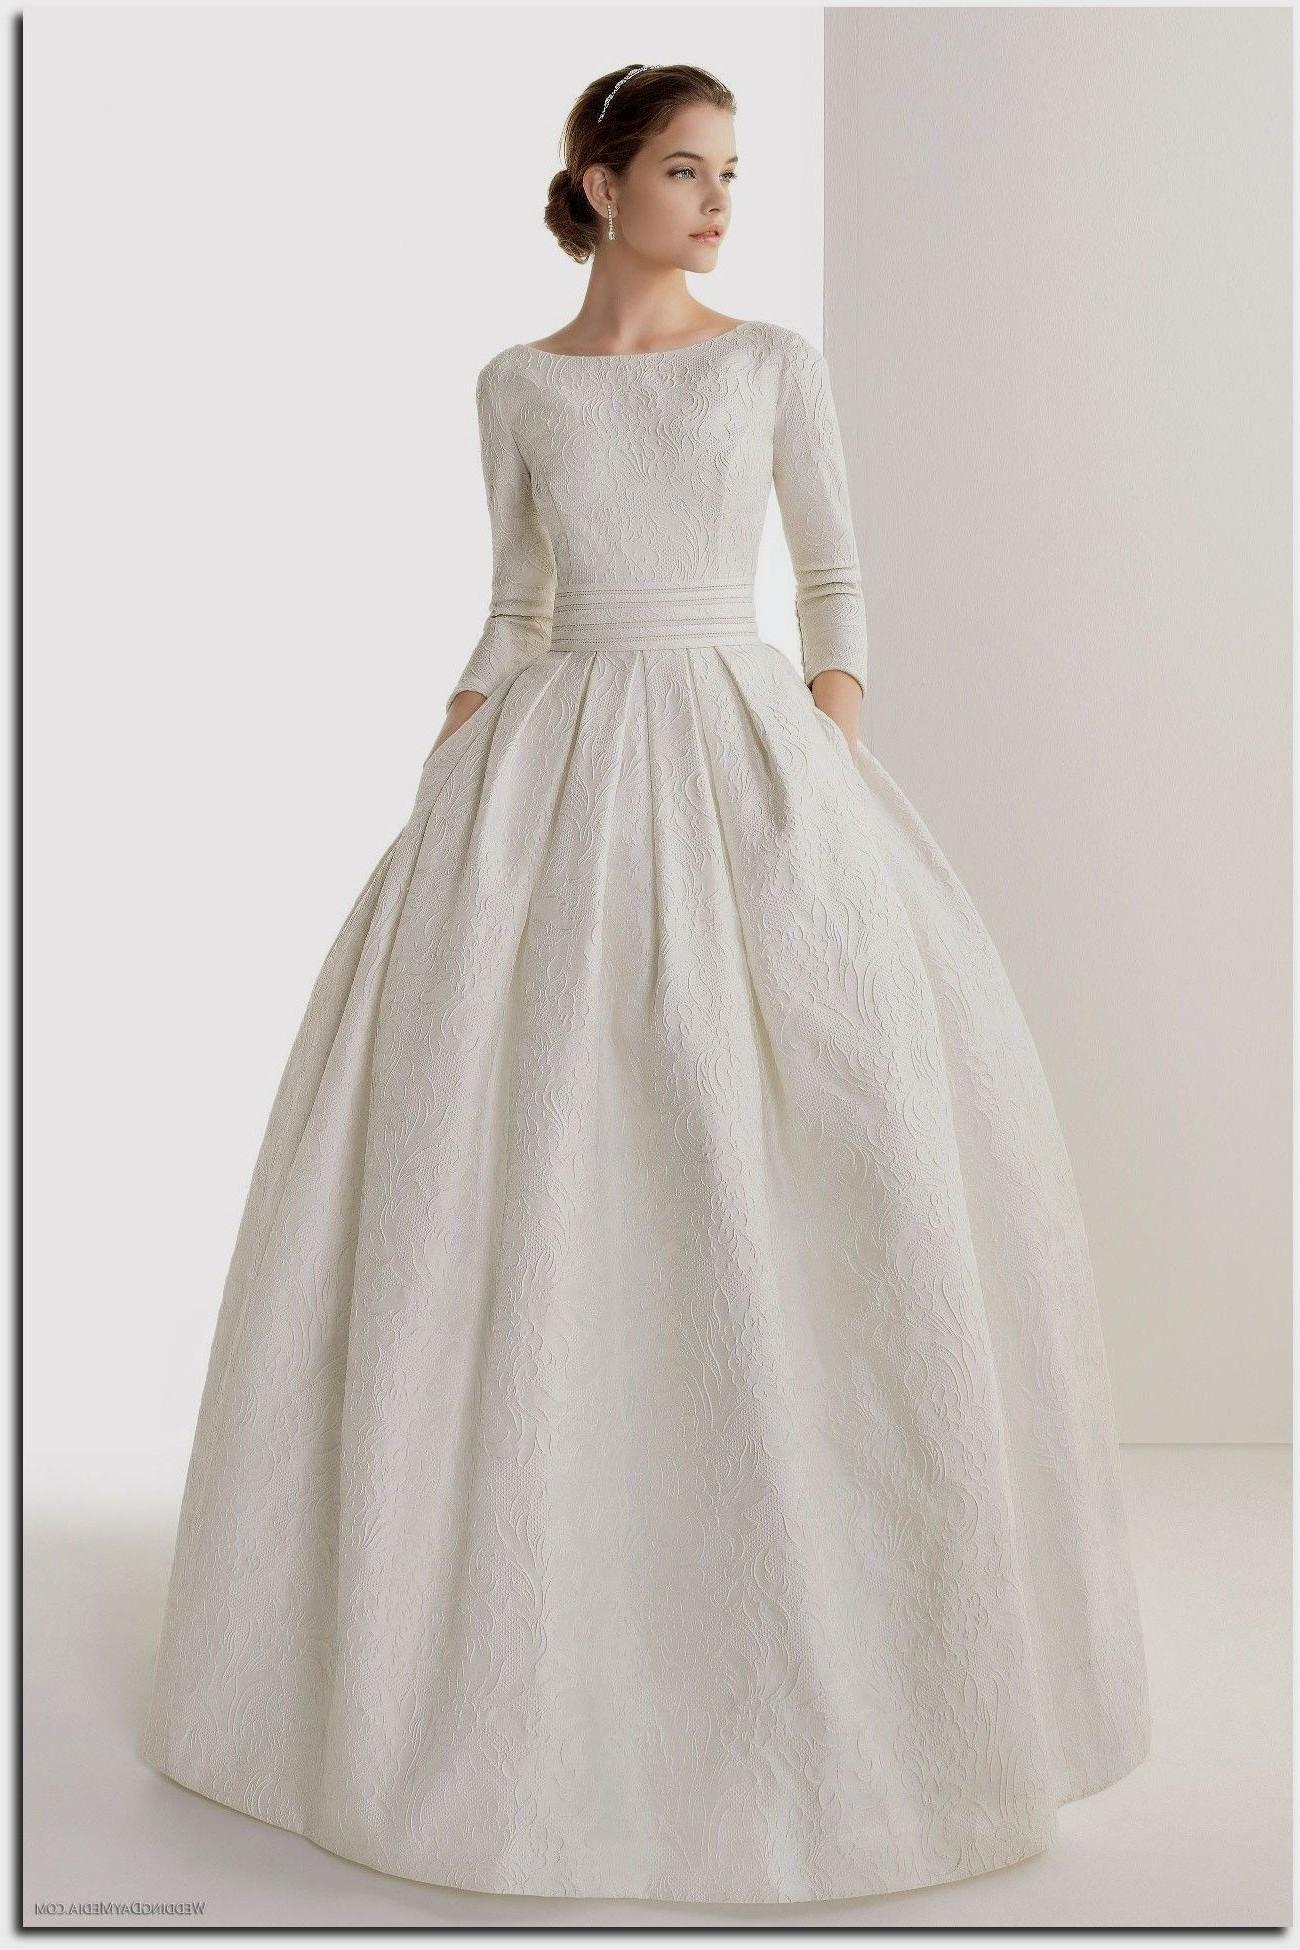 Raw Silk Dress Google Search White Dress Pinterest Wedding Wedding Dress Long Sleeve Wedding Dress Sleeves Casual Wedding Dress